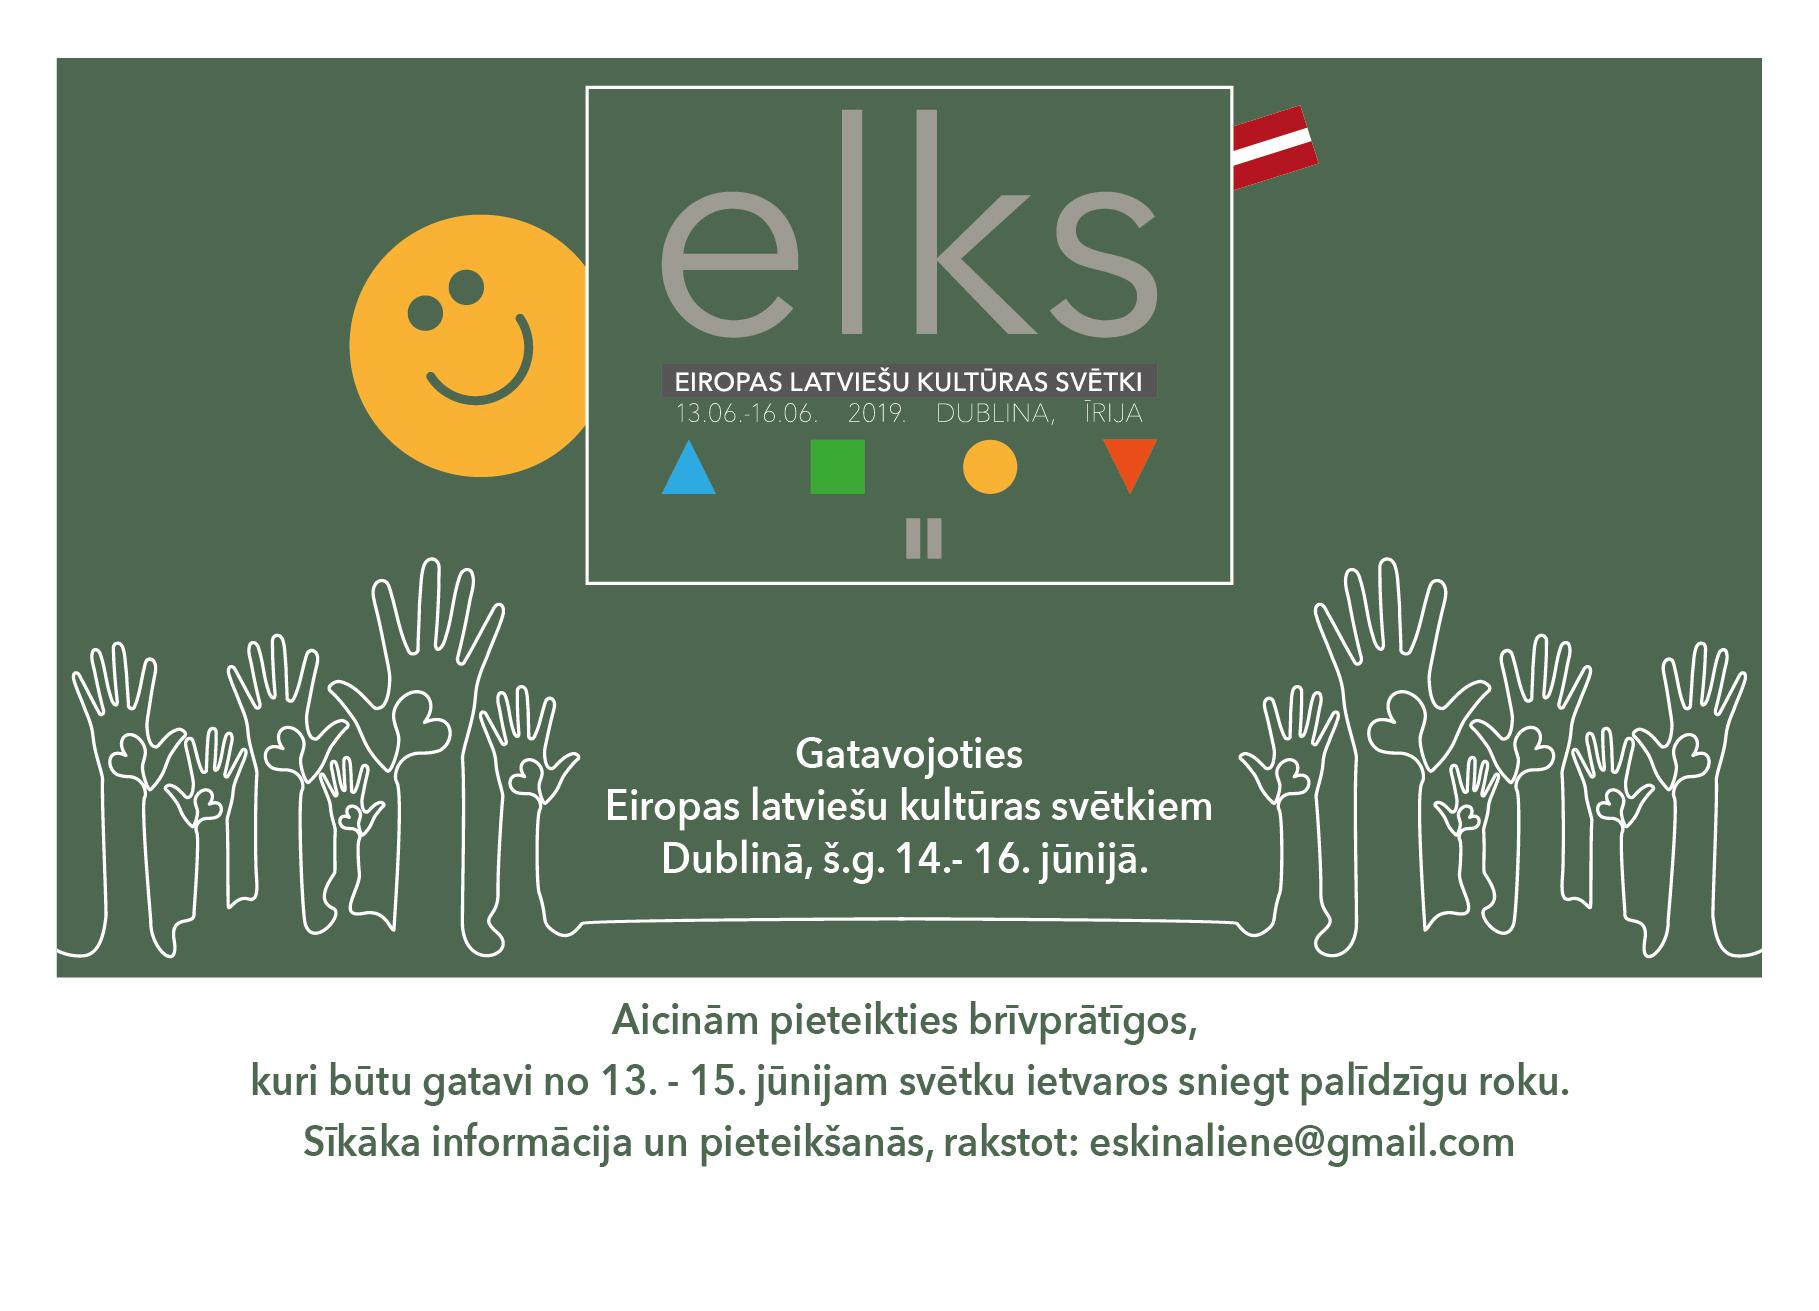 ELKS_Brivpratigie-01